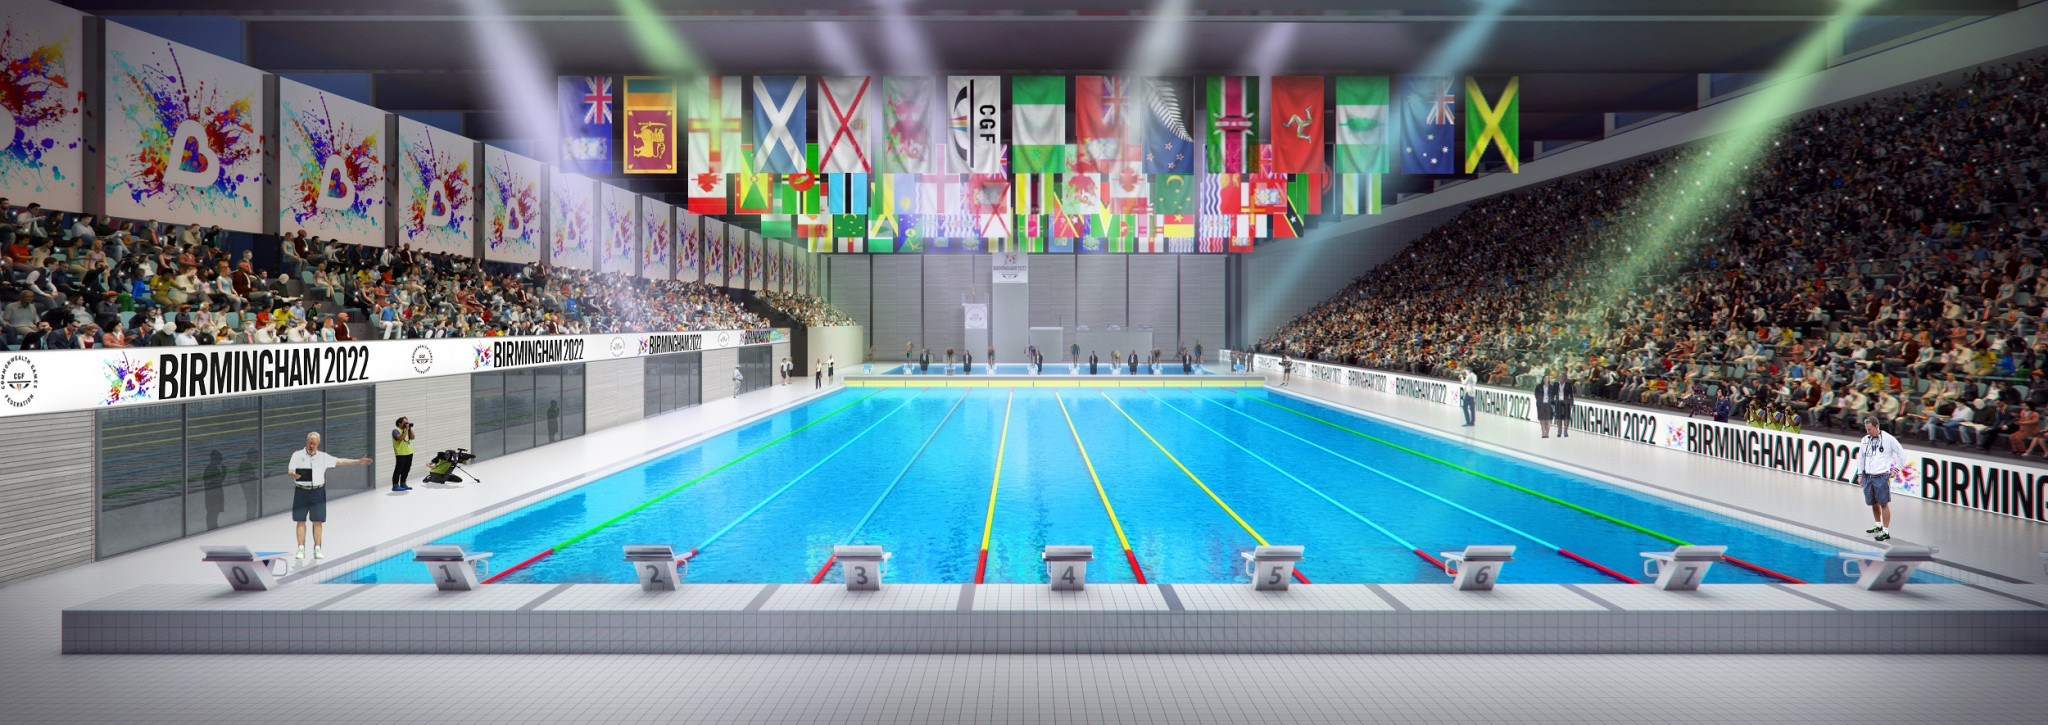 Plans For Birmingham 2022 Aquatics Venue Revealed